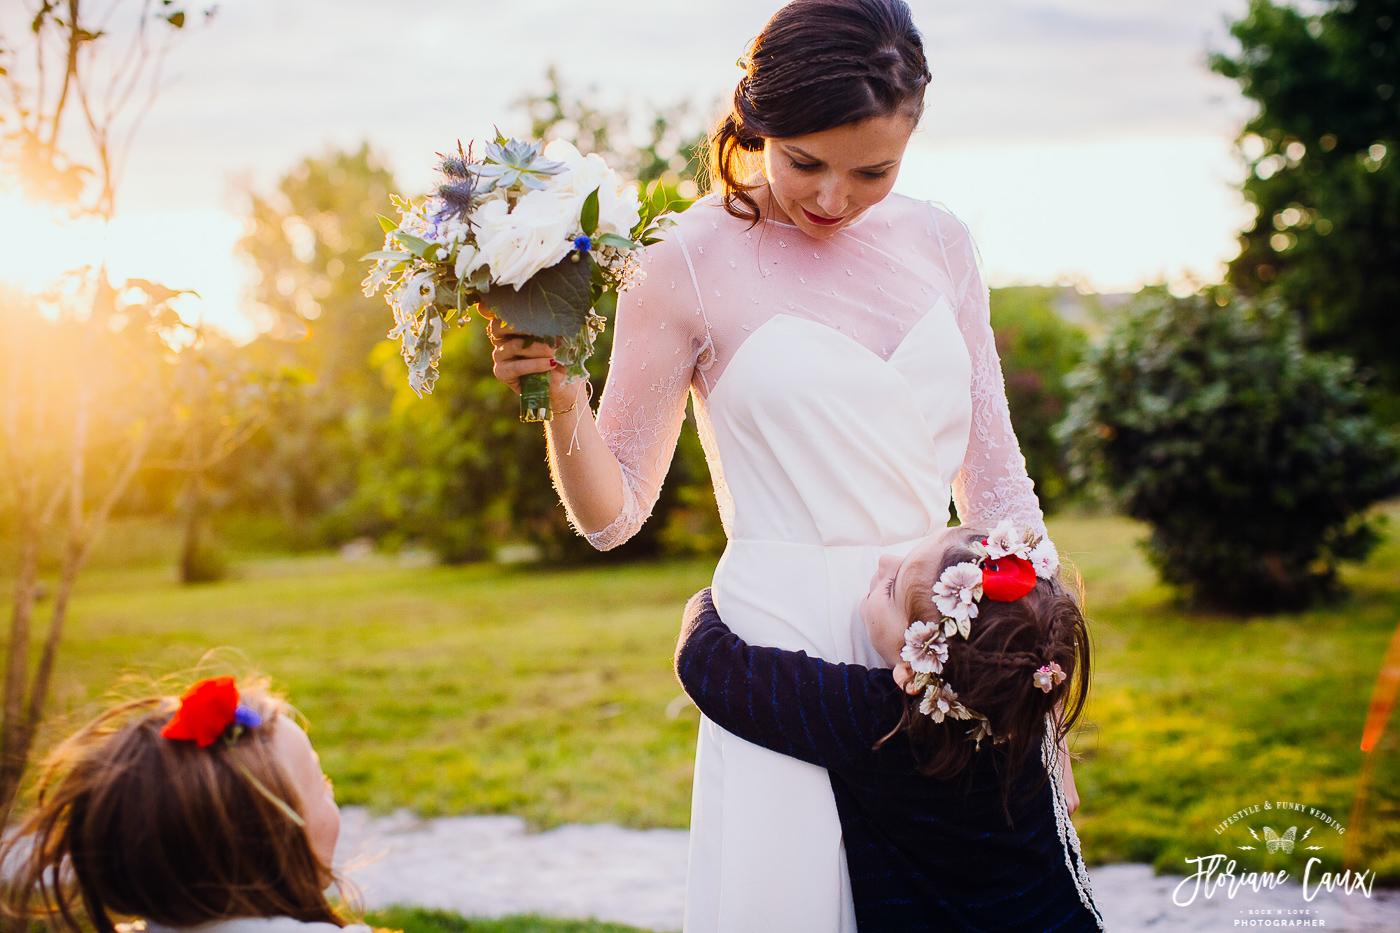 photographe-mariage-pays-basque-Floriane-Caux (84)